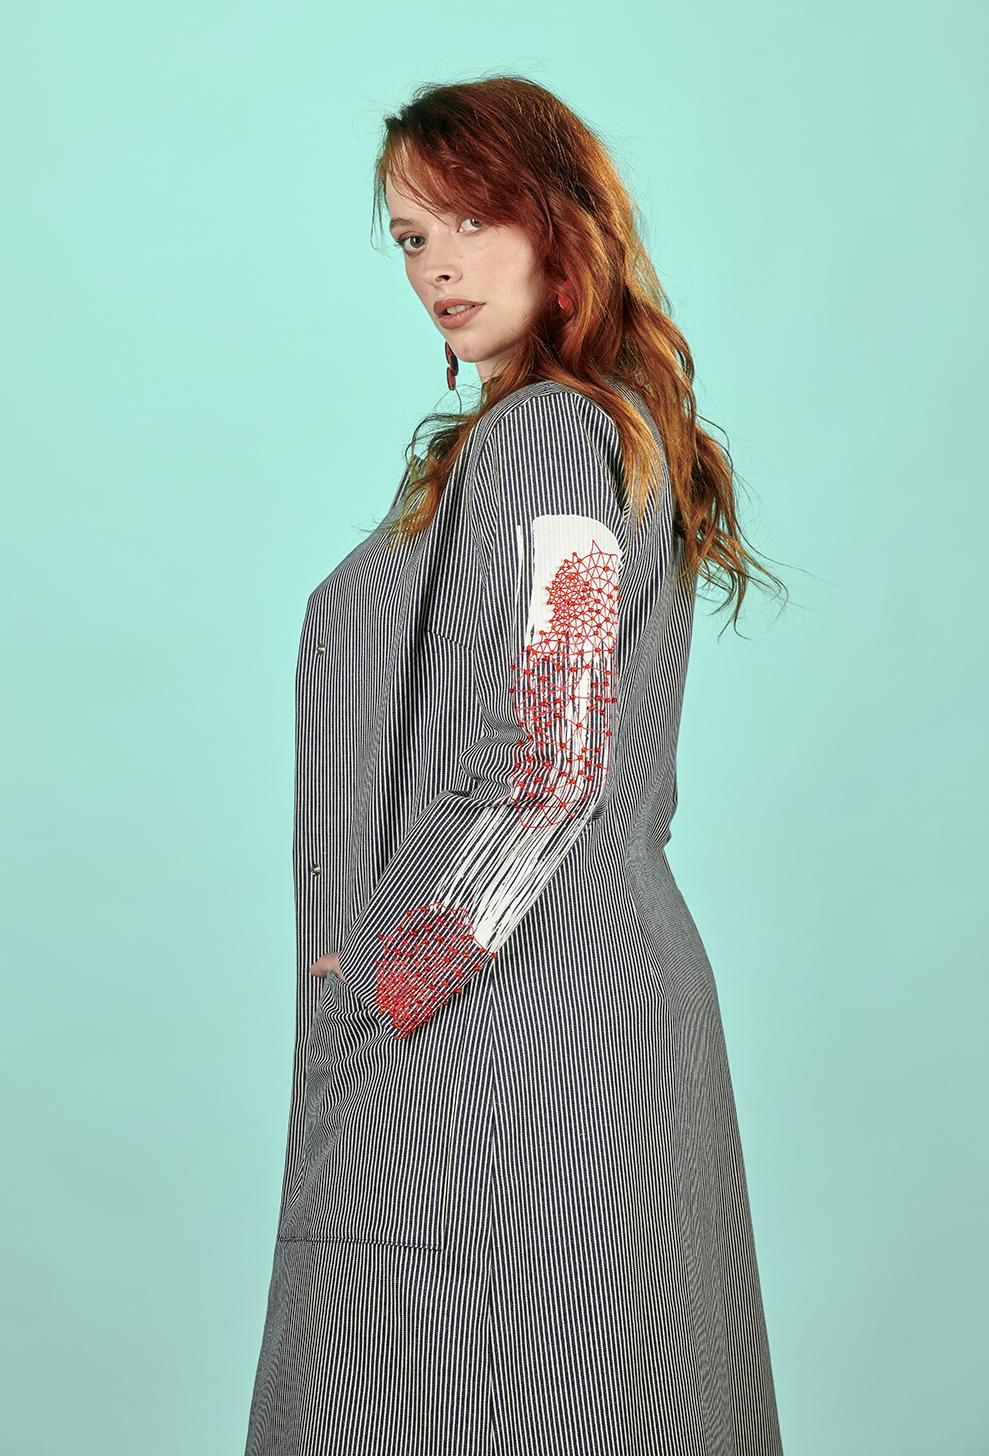 manteau femme été rayures fait main